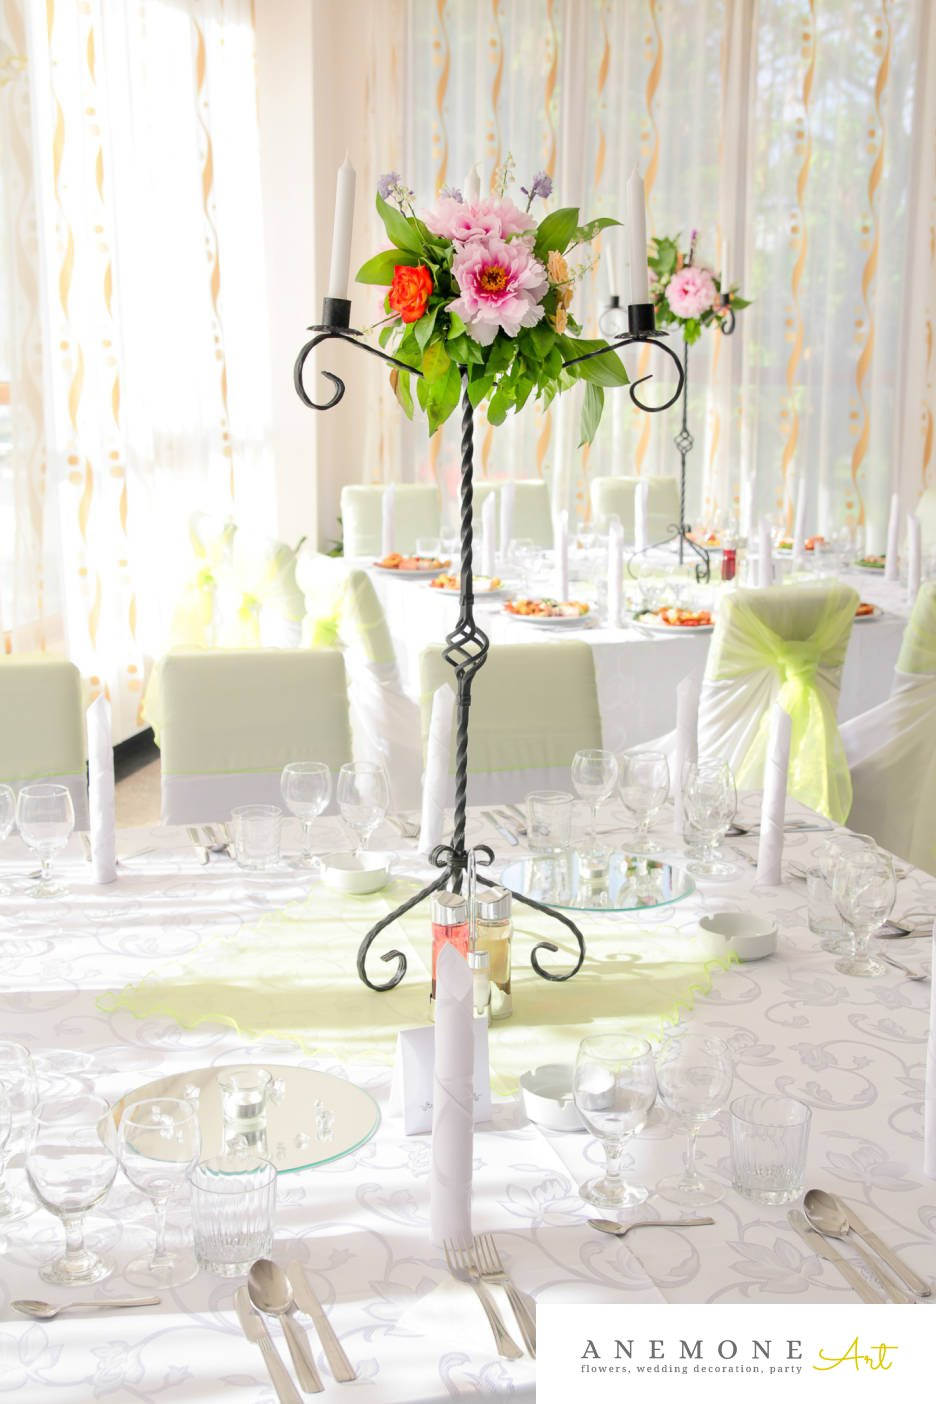 Poza, foto cu Flori de nunta bujori, decor masa, lumanare, rosu, roz, trandafiri in Arad, Timisoara, Oradea (wedding flowers, bouquets) nunta Arad, Timisoara, Oradea